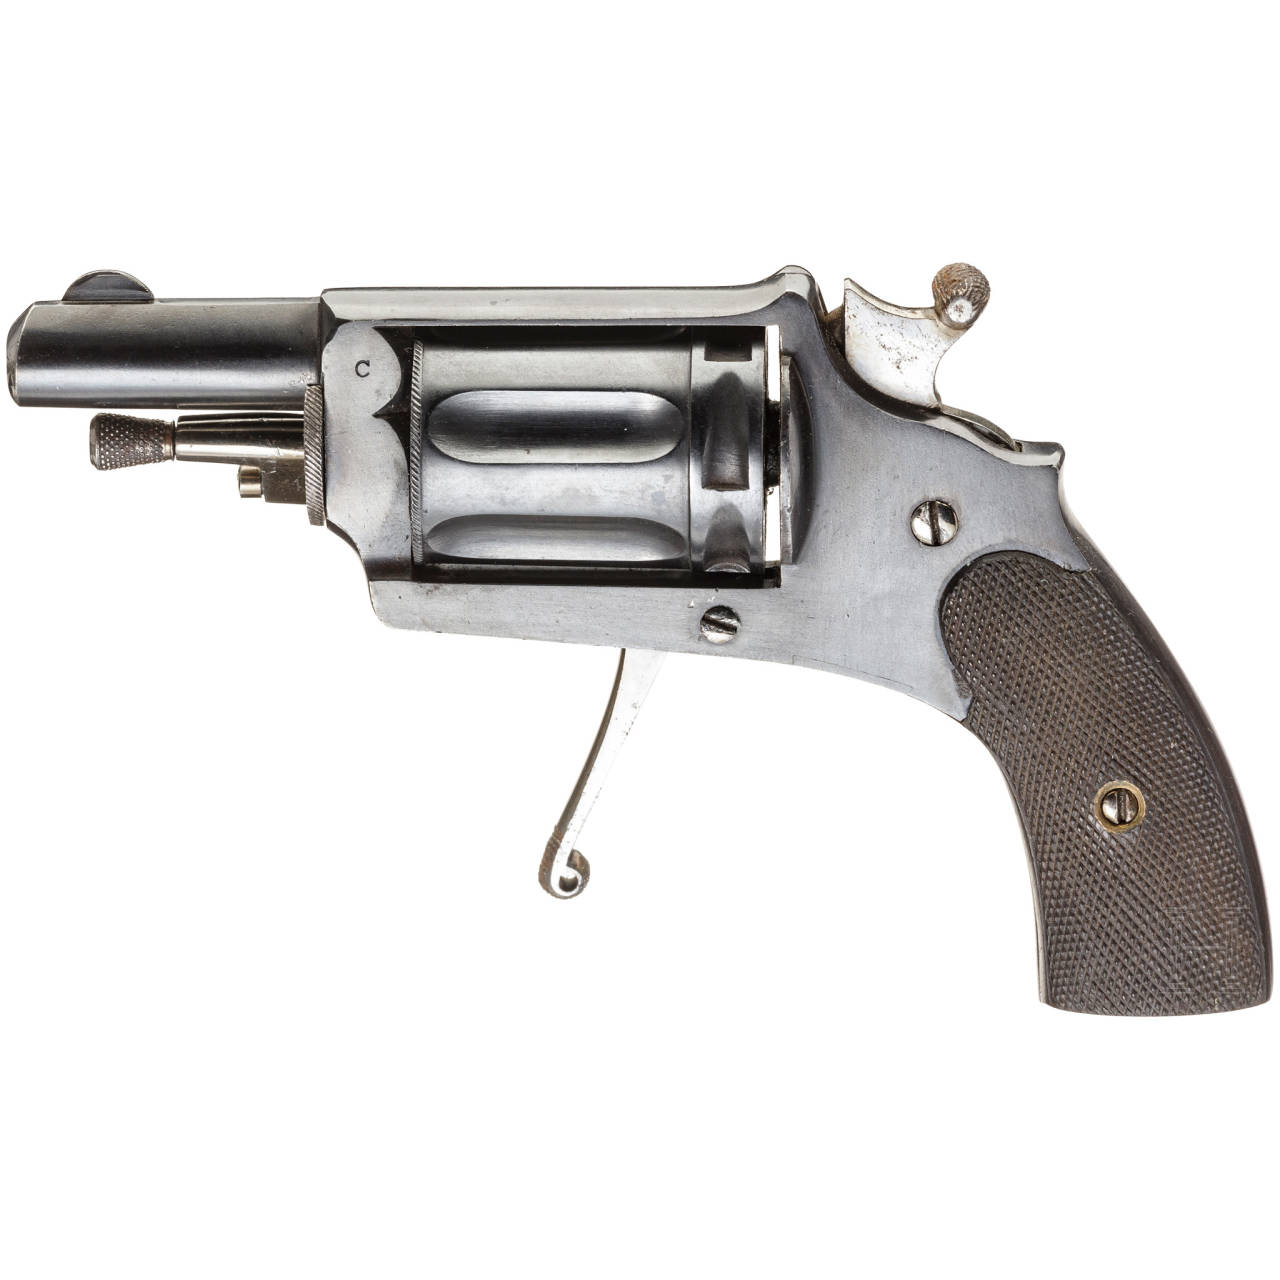 Belgischer Velodog-Revolver